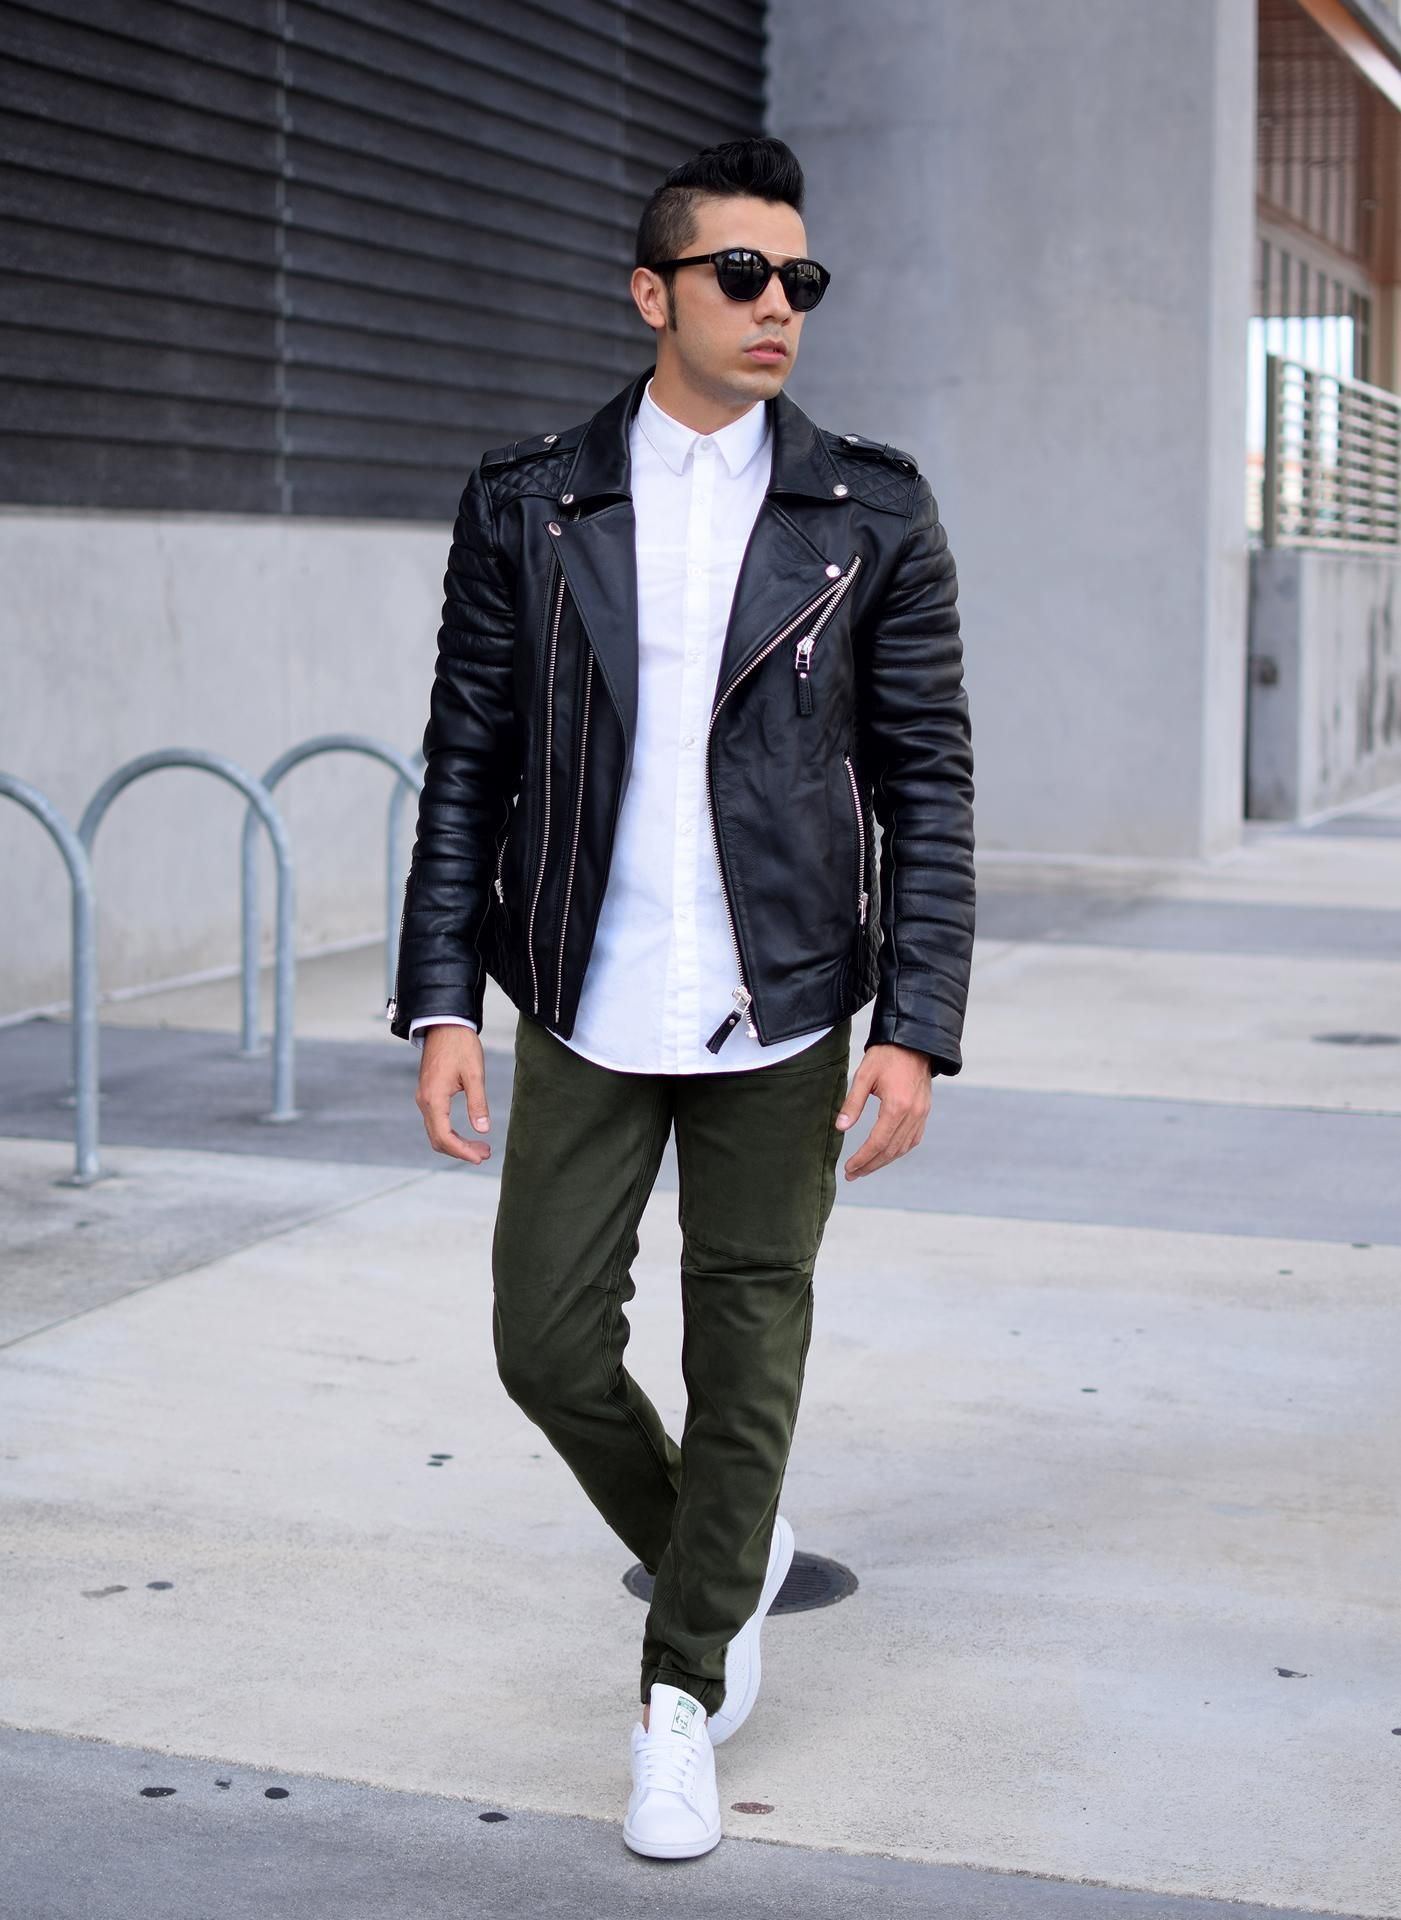 Men's Black Leather Biker Jacket, White Dress Shirt, Olive